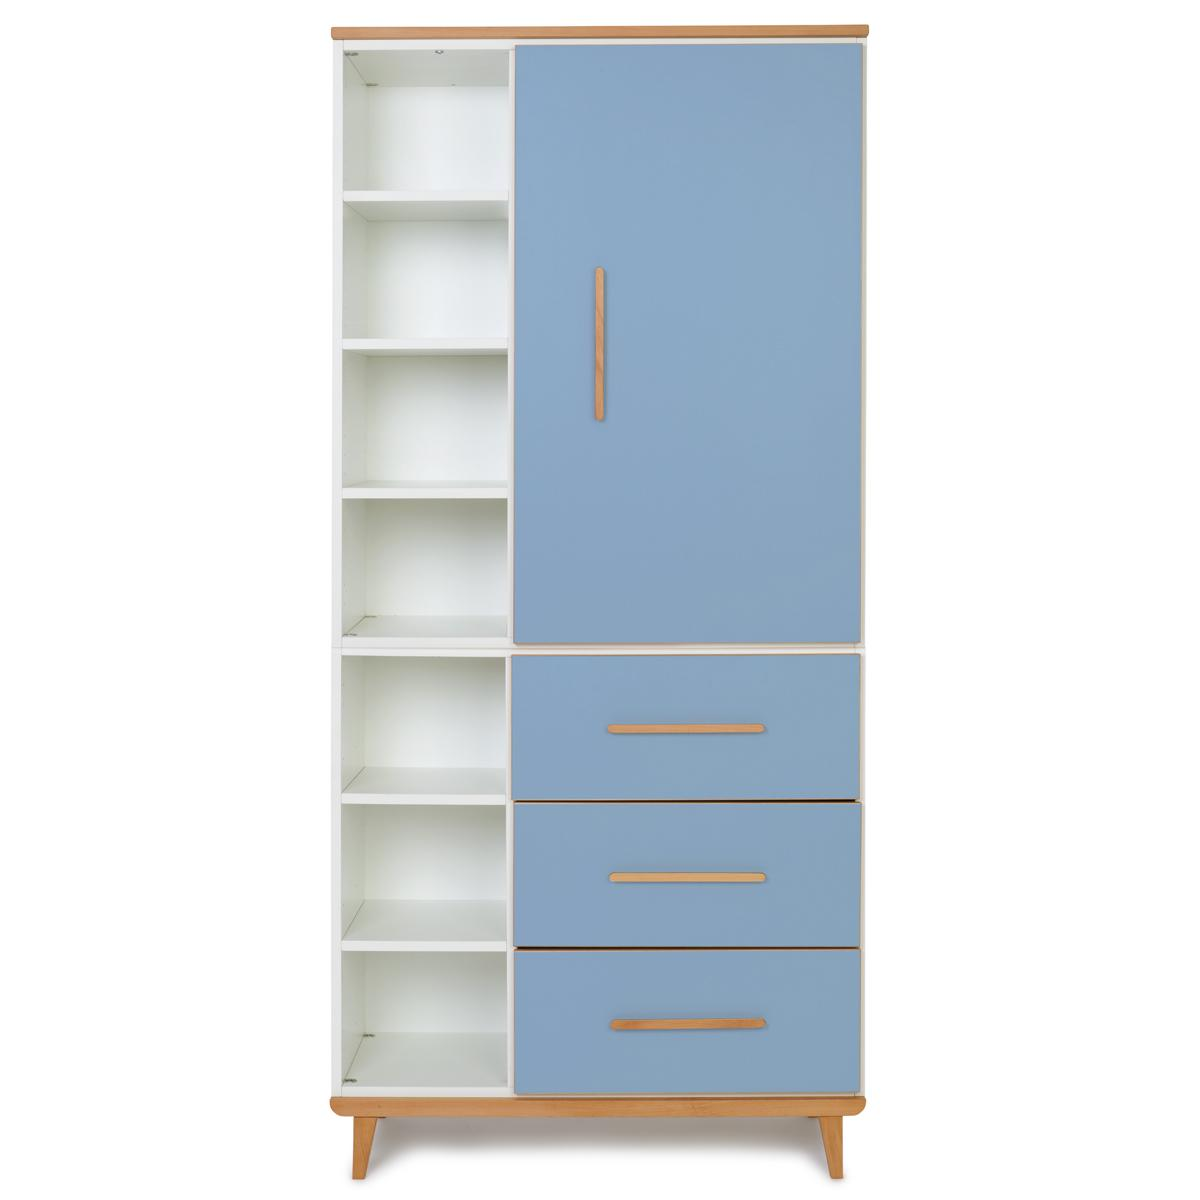 Armoire 198cm 1 porte 3 tiroirs NADO By A.K. capri blue